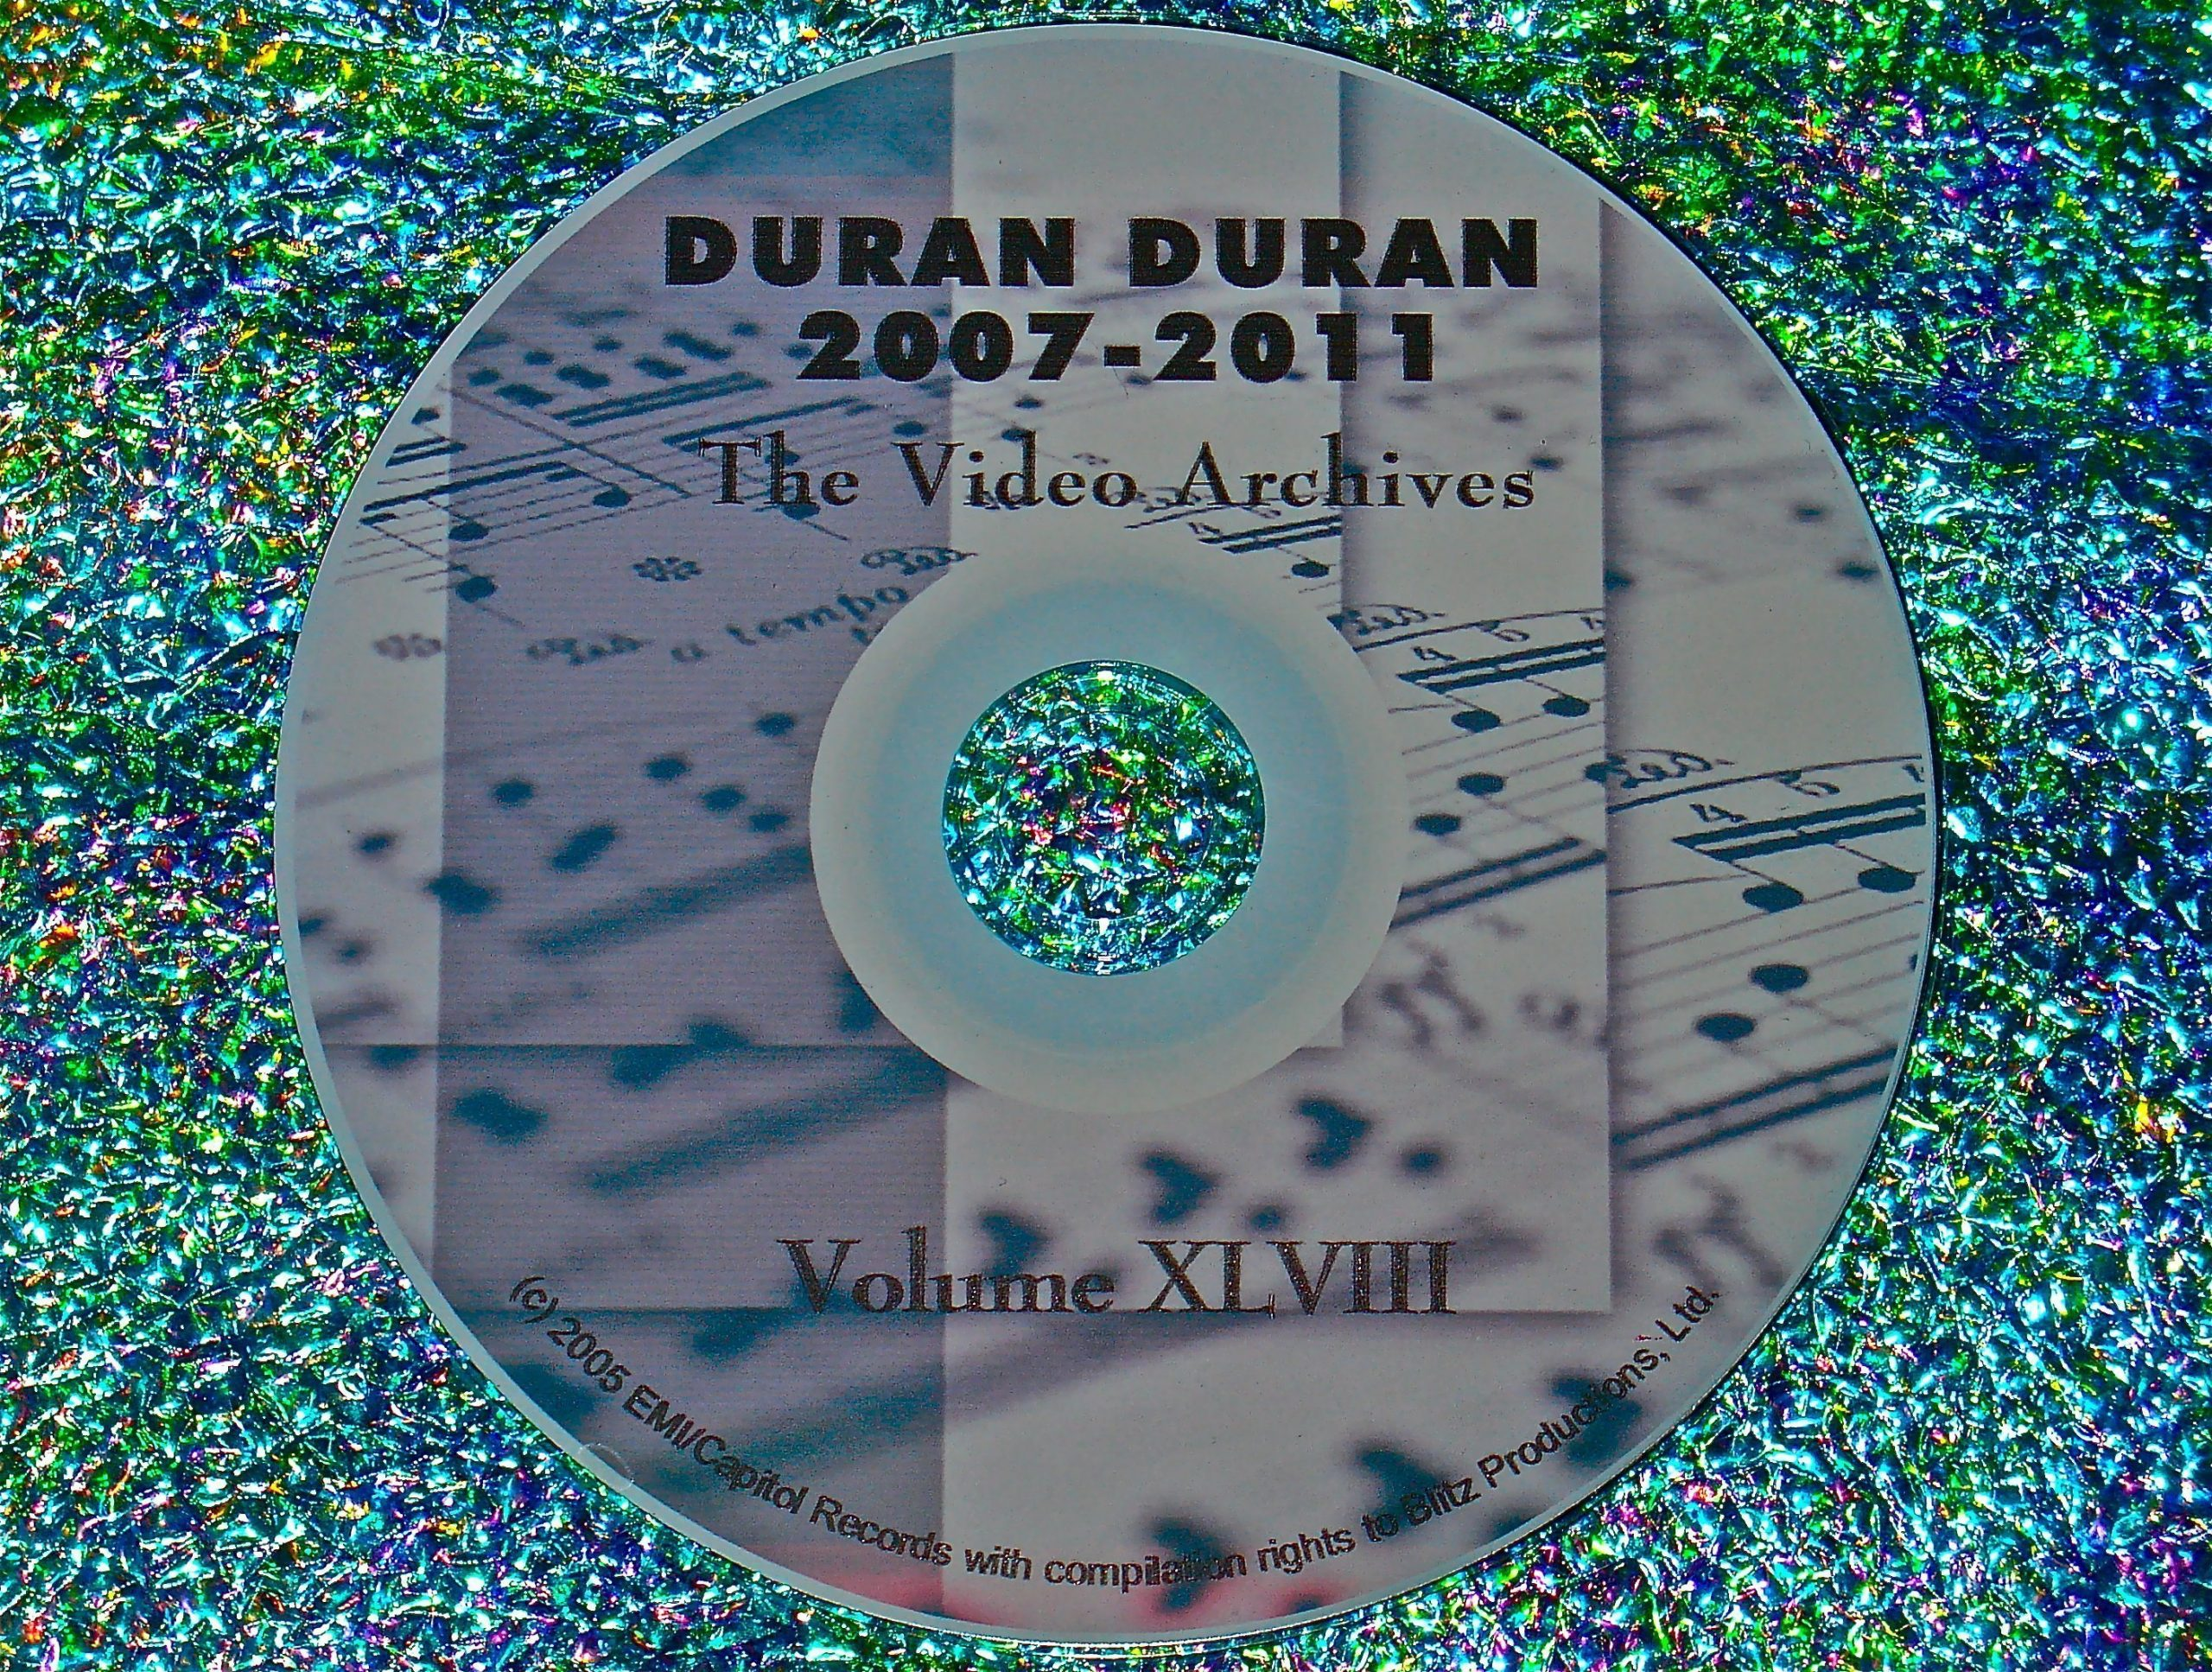 DURAN DURAN - The Video Archives VOLUME XLVIII 2007-2011